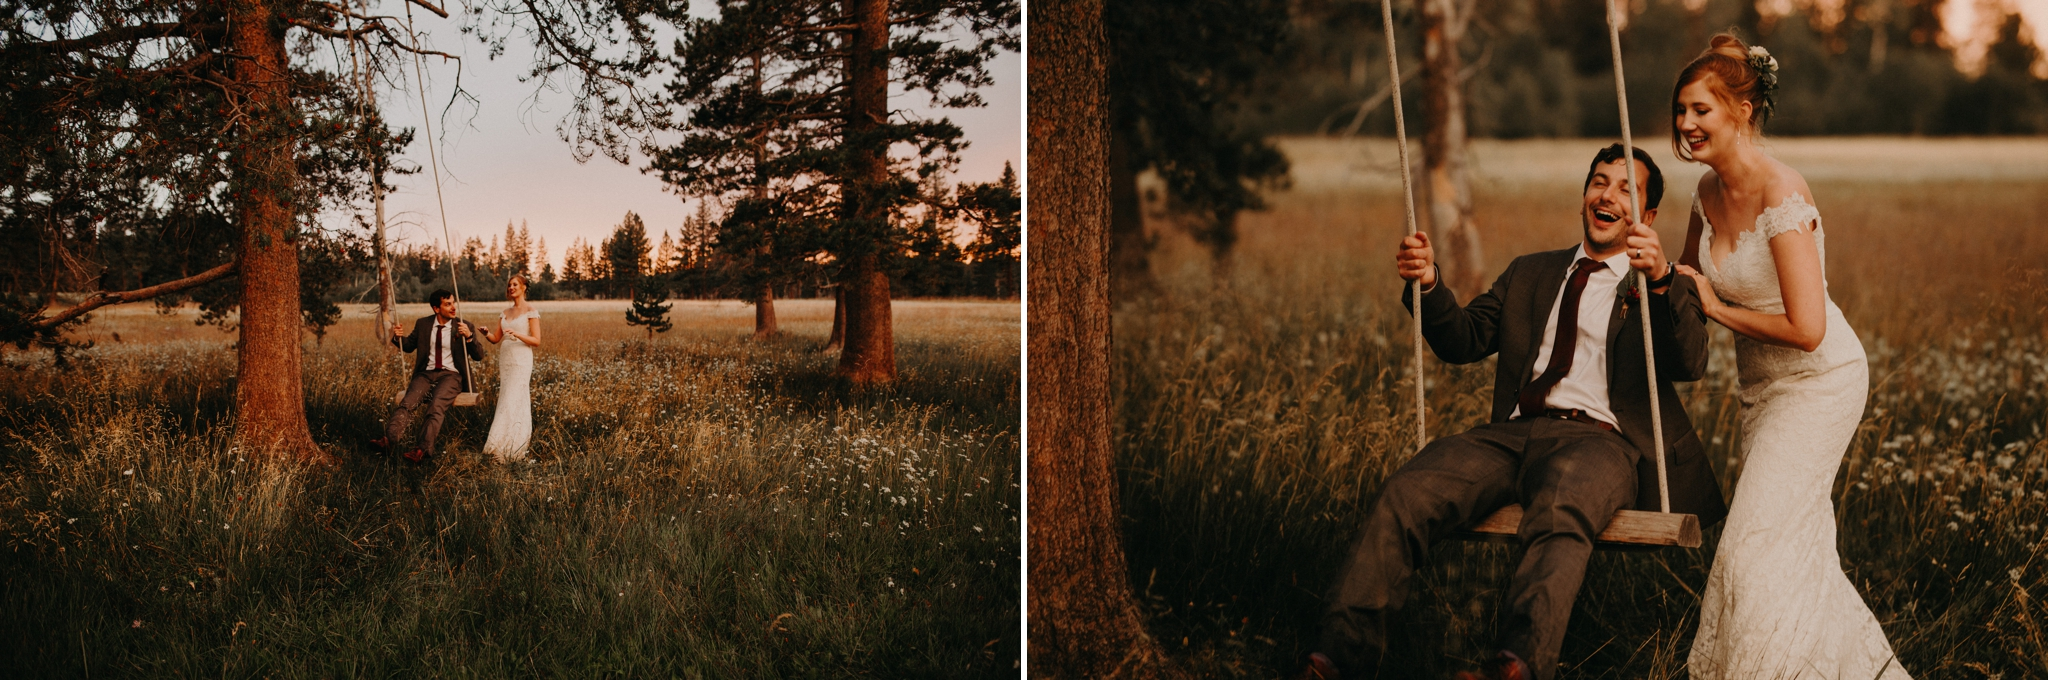 tahoe-wedding-photographer16.jpg